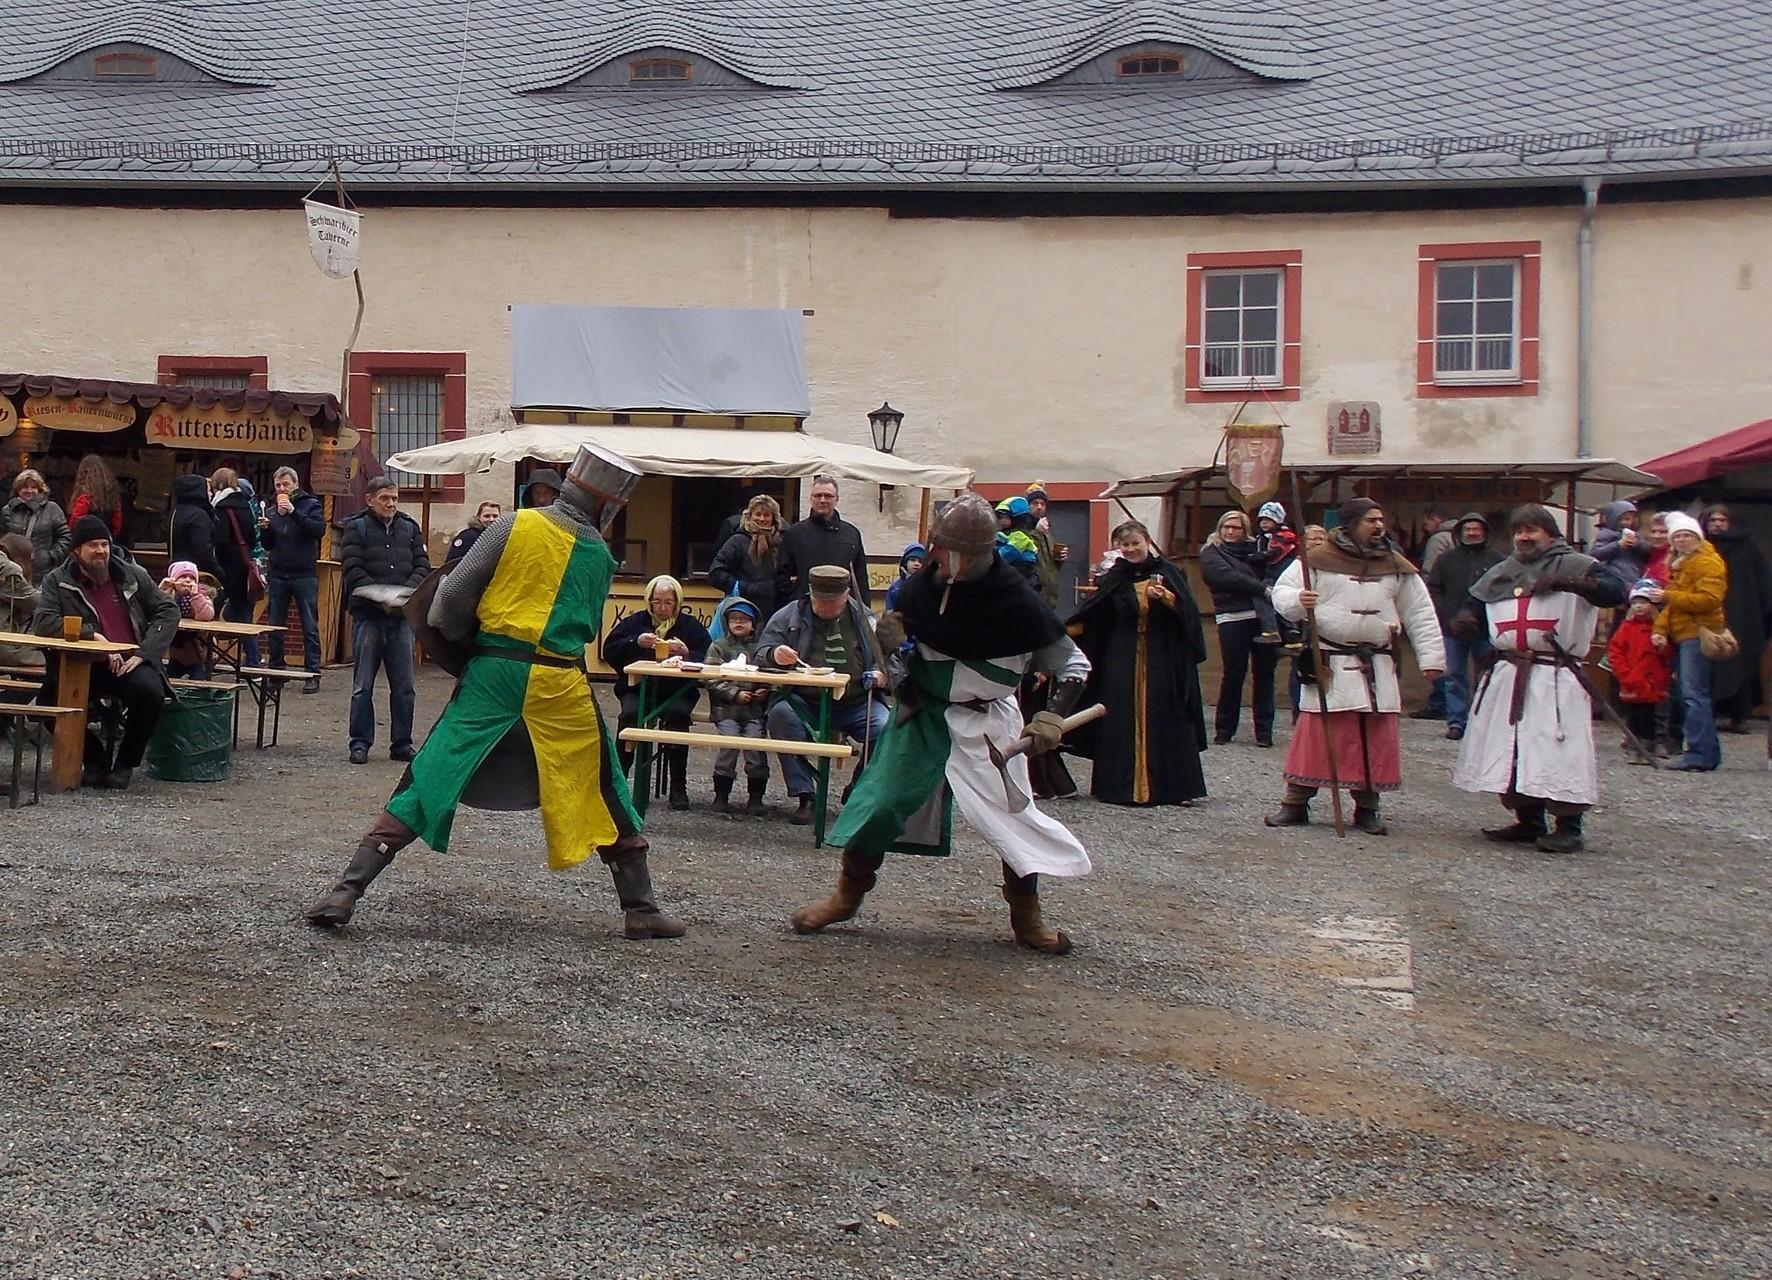 Osterburgfest